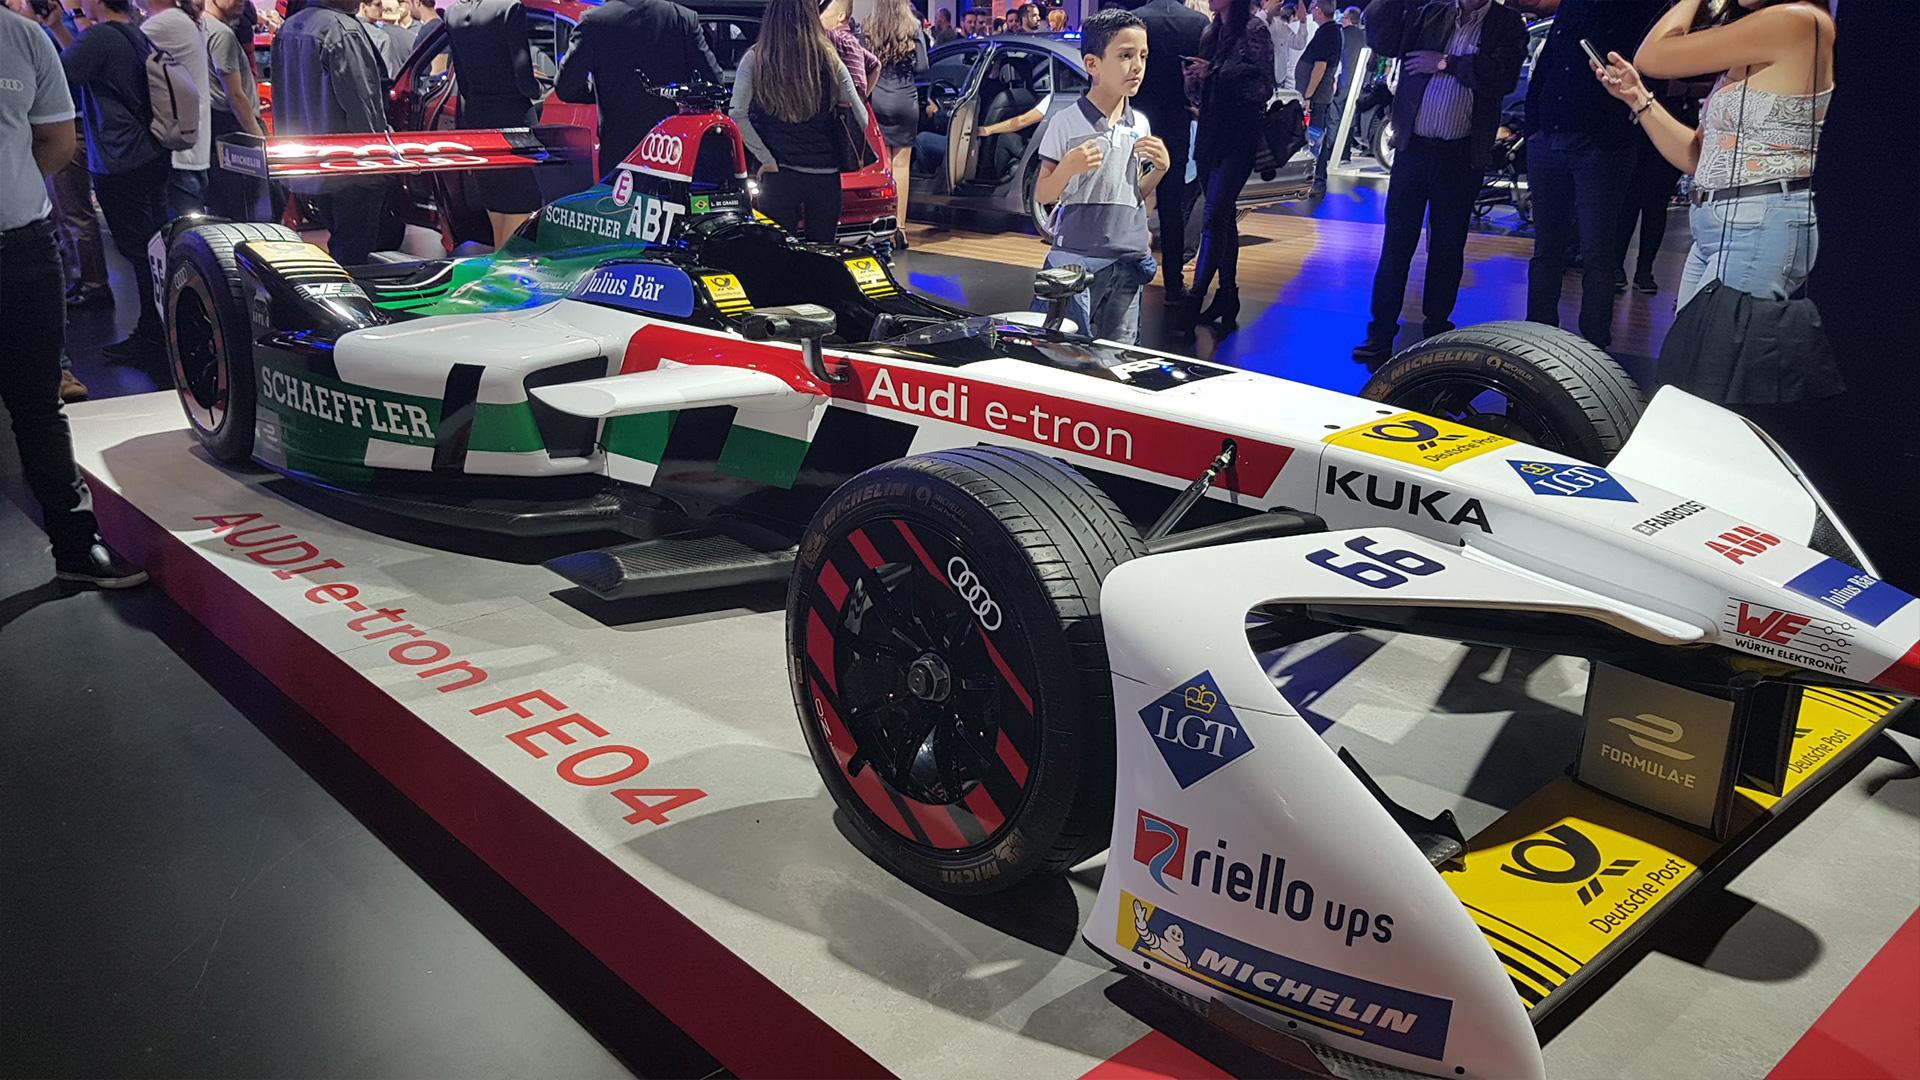 Audi e-tron FE04 de Lucas di Grassi